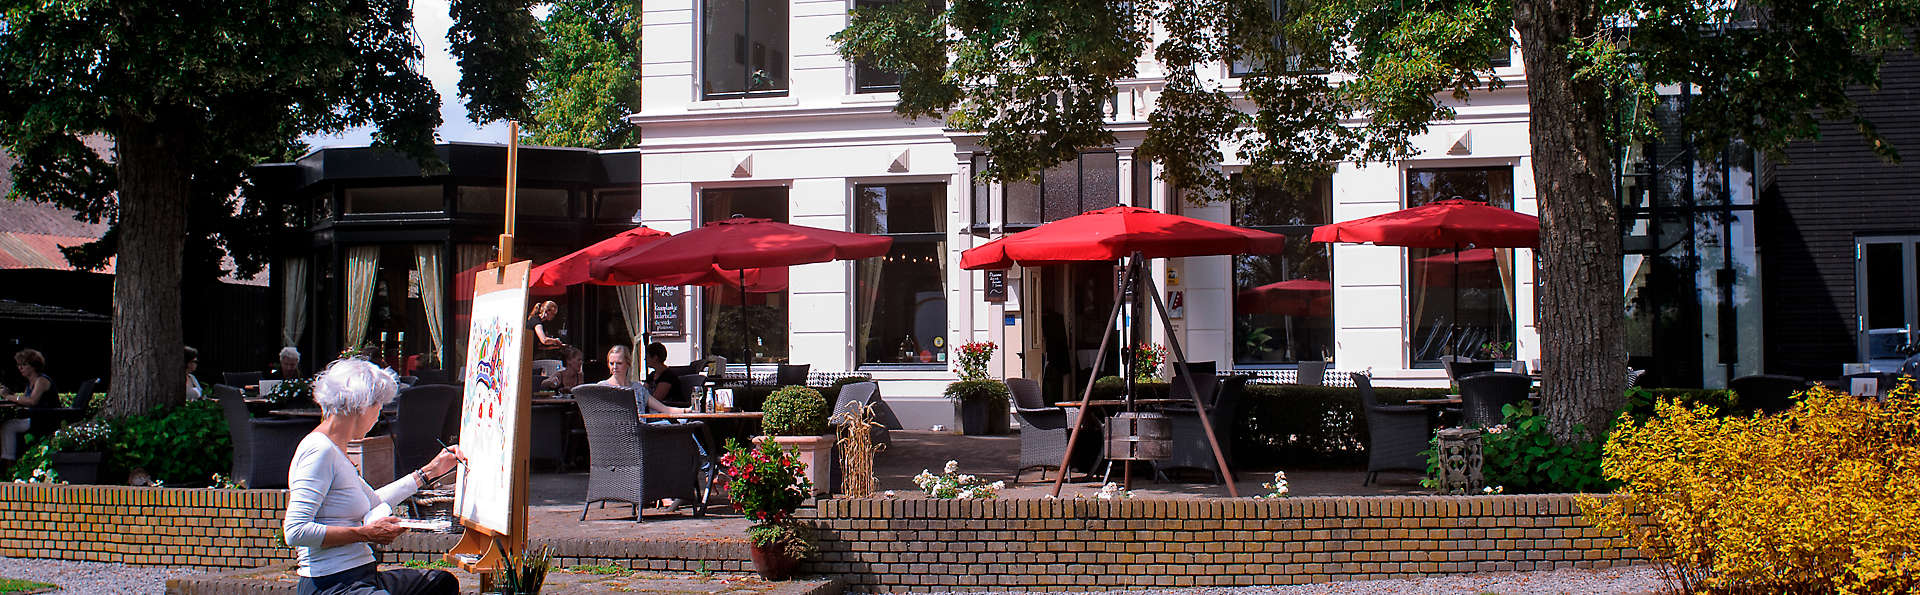 Hotel Restaurant Lunia - edit_front_activities3.jjpg.jpg